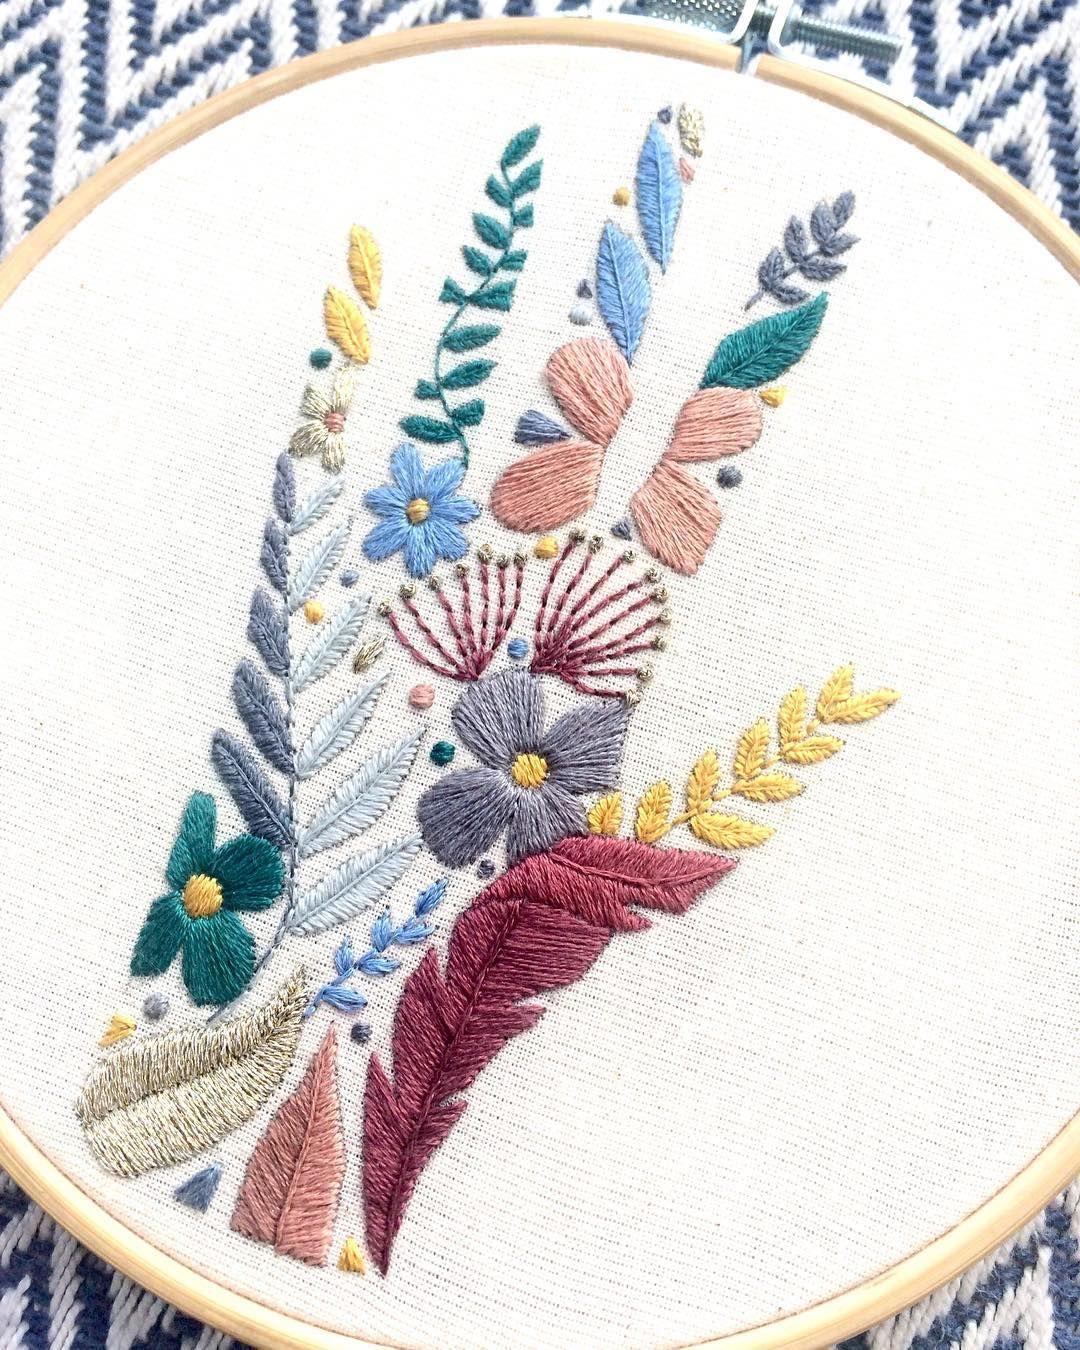 Pin de Amaranta Hernanadez en Bordados | Pinterest | Bordado ...